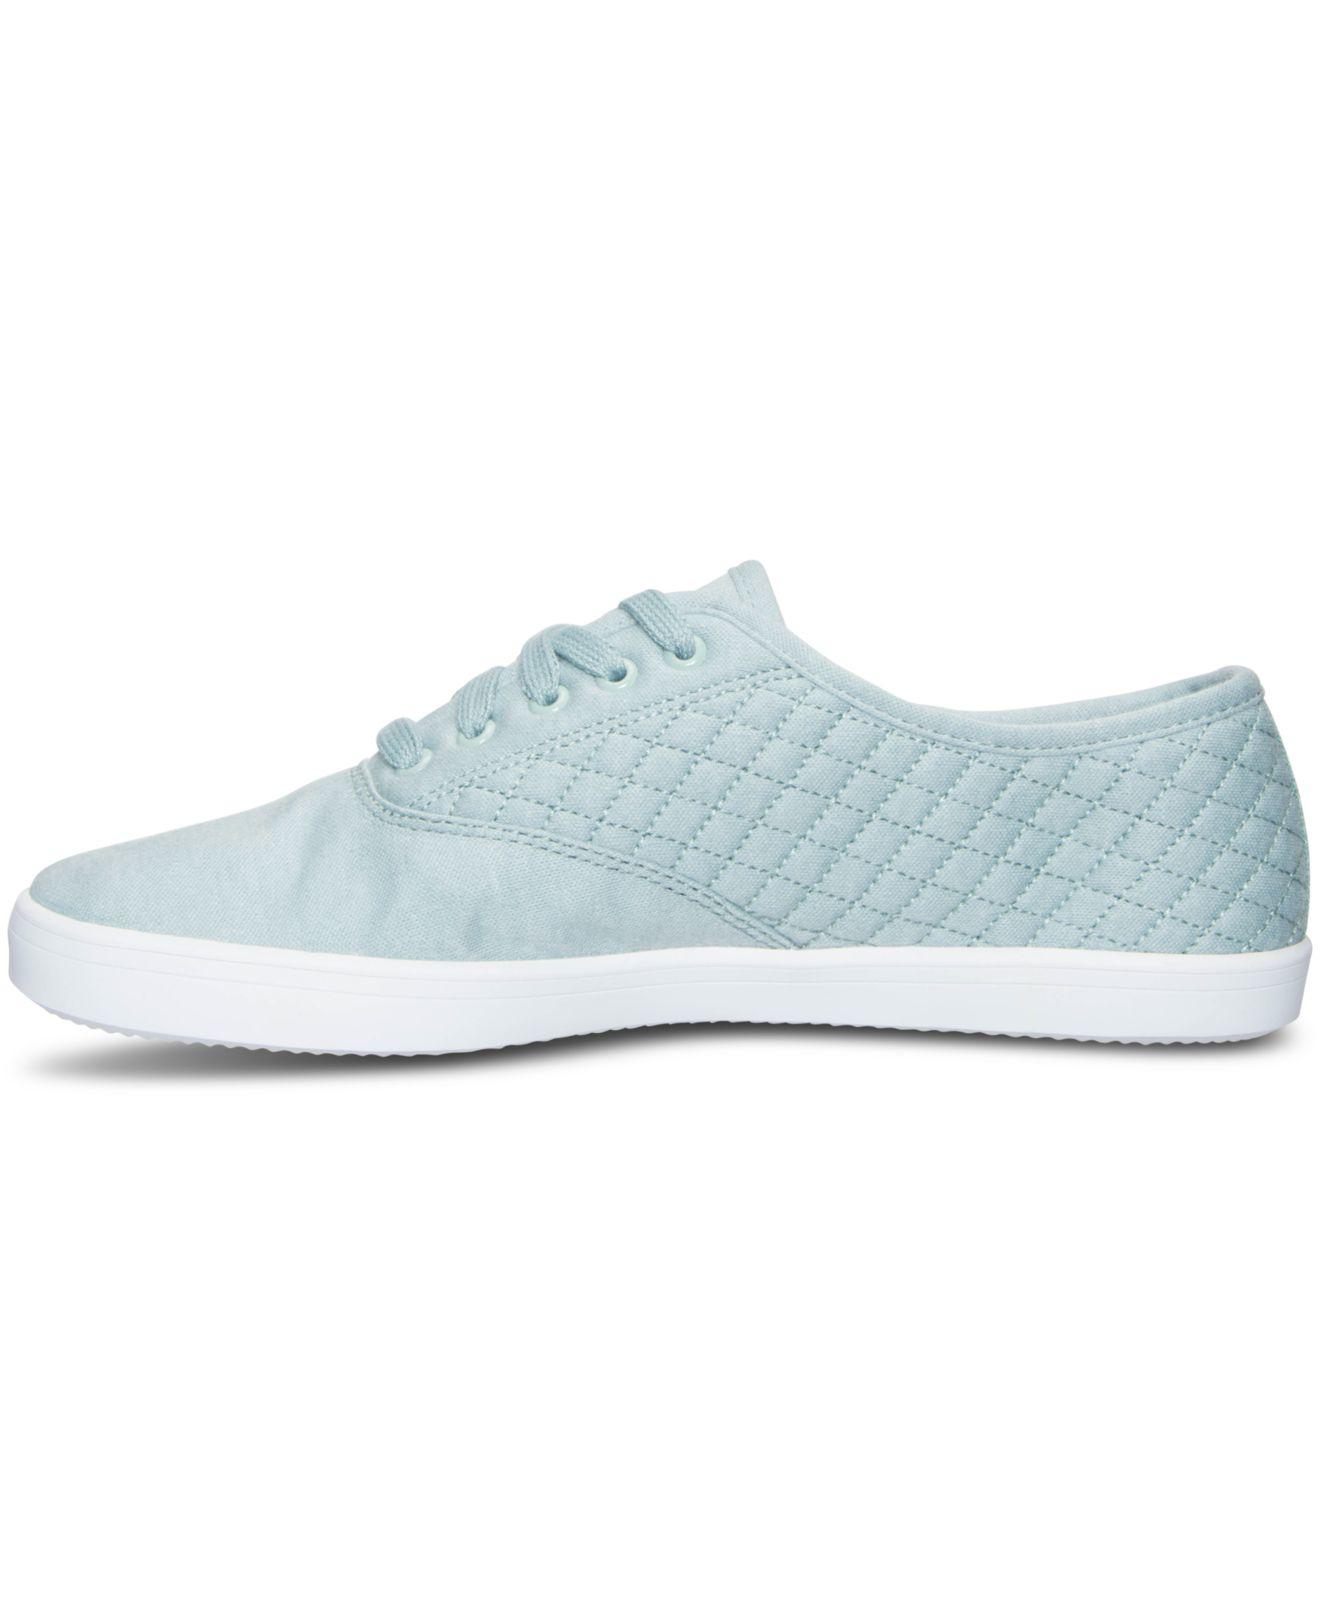 b9c90b9a8e69e0 Lyst - Reebok Women s Royal Tenstall Casual Sneakers From Finish ...